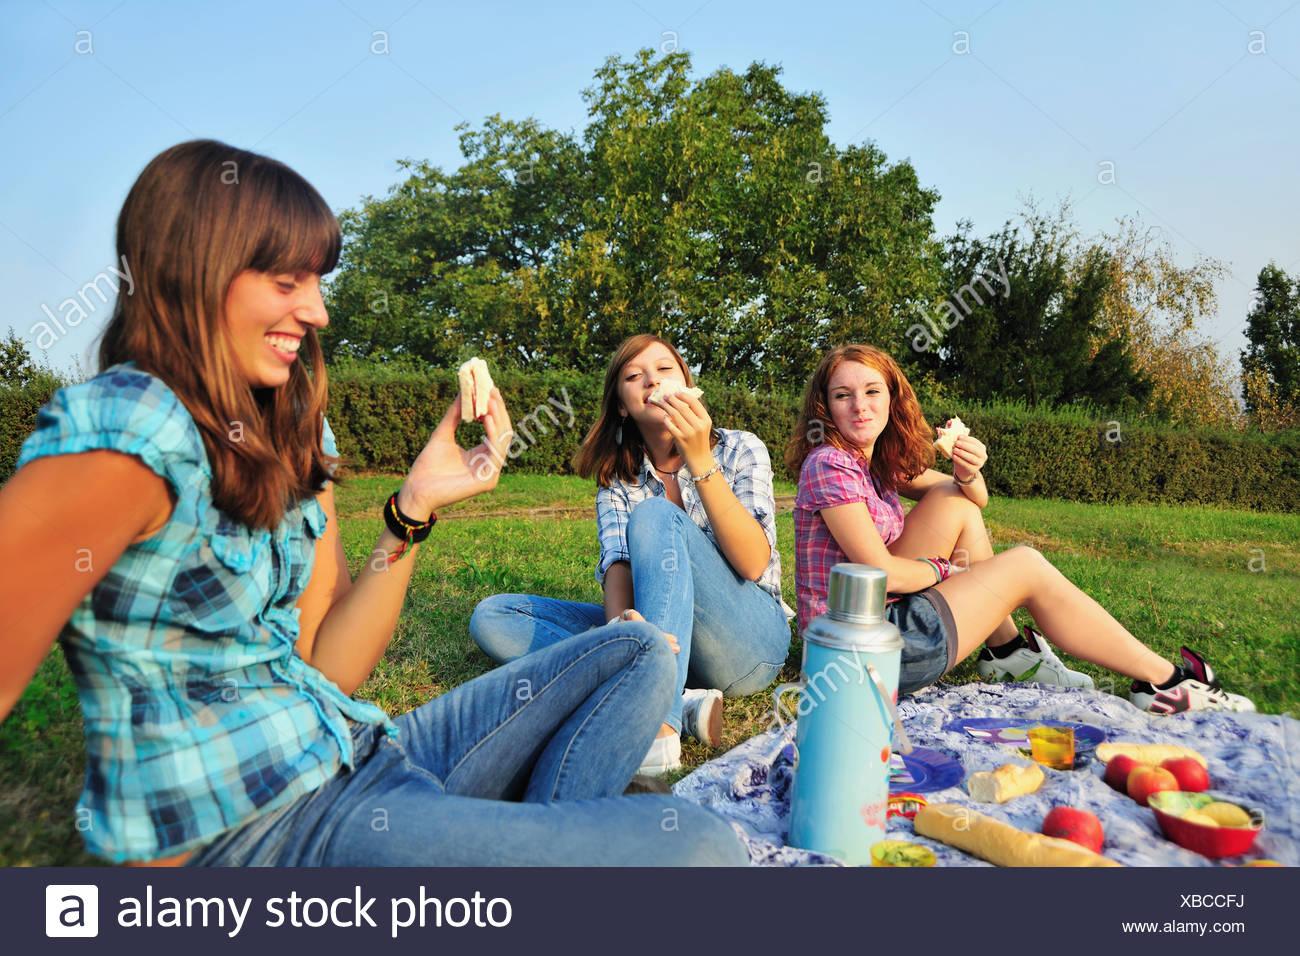 Teenage girls picnicking in rural field - Stock Image